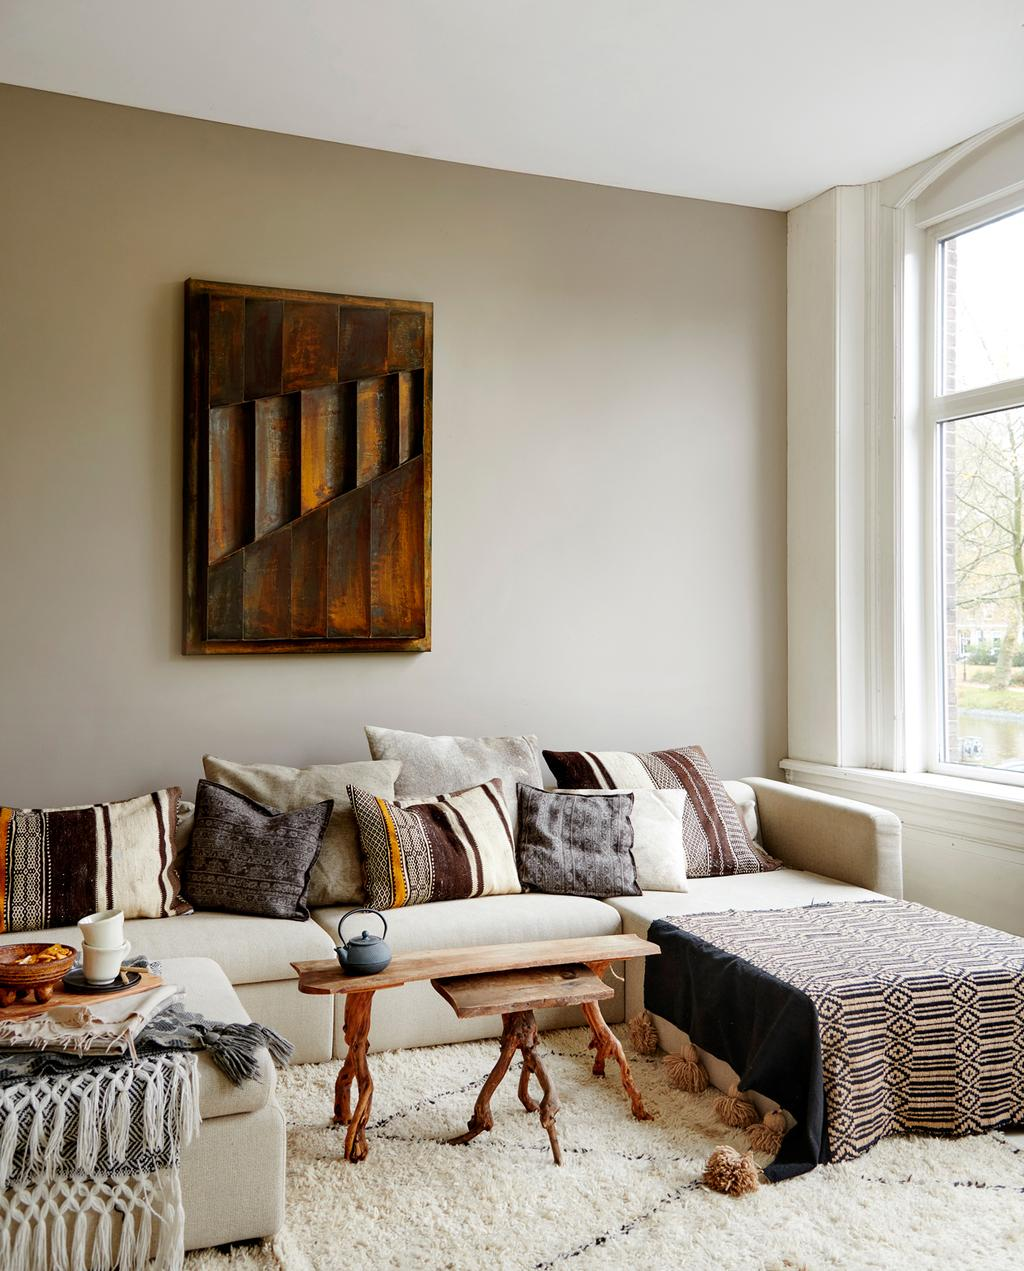 vtwonen 2-2020 | woonkamer roest schilderij